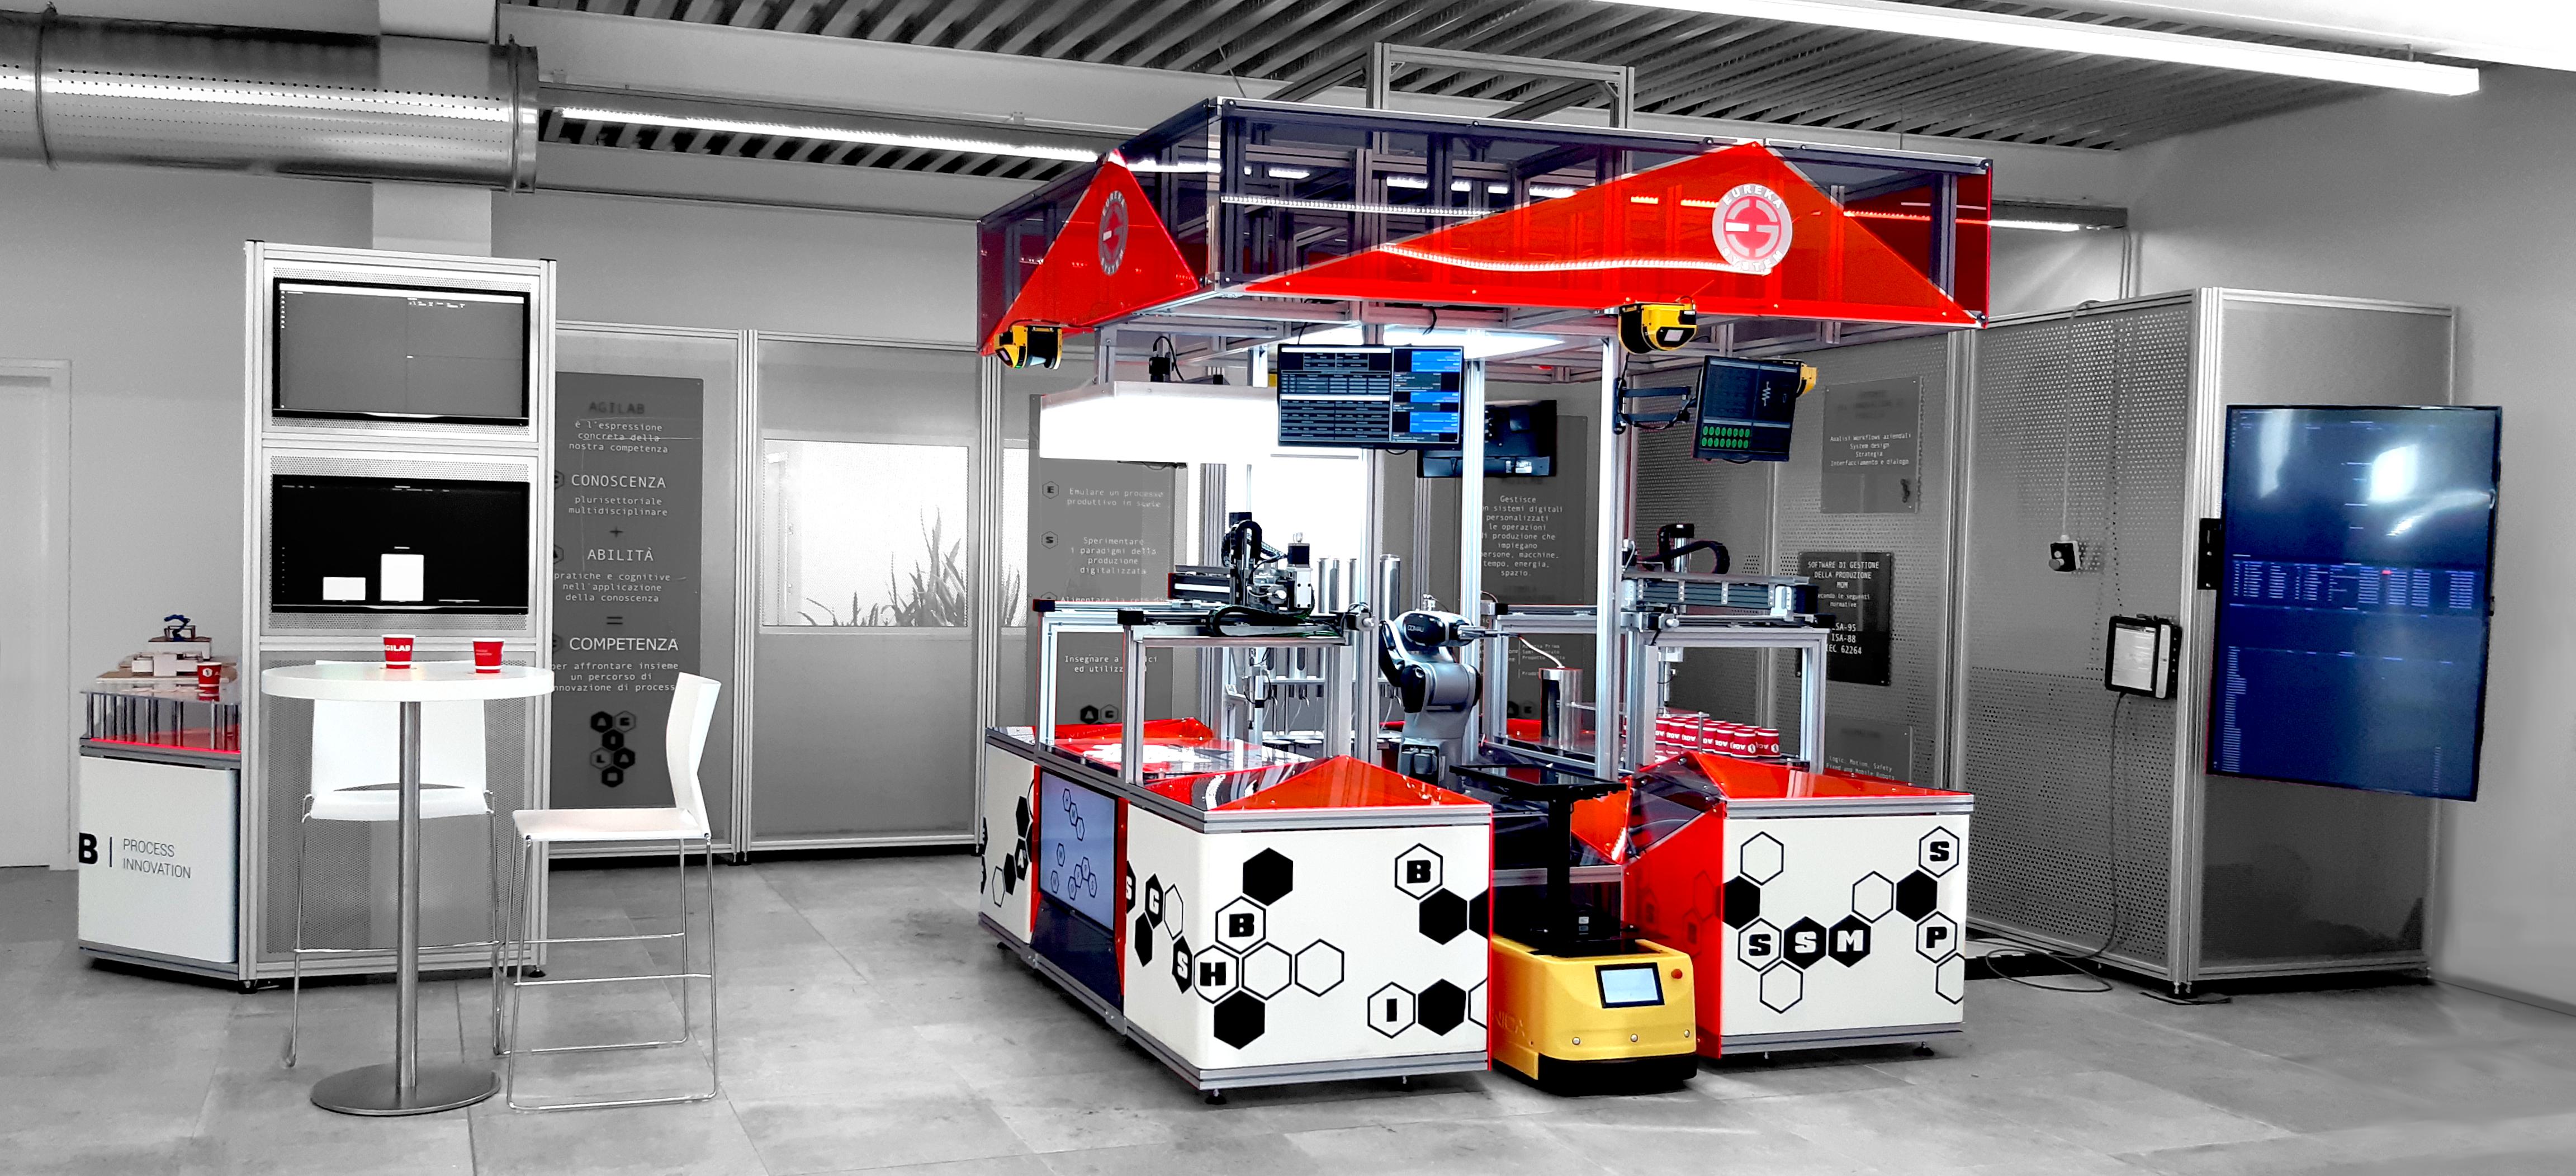 AgiLAB robocentric interactive laboratory